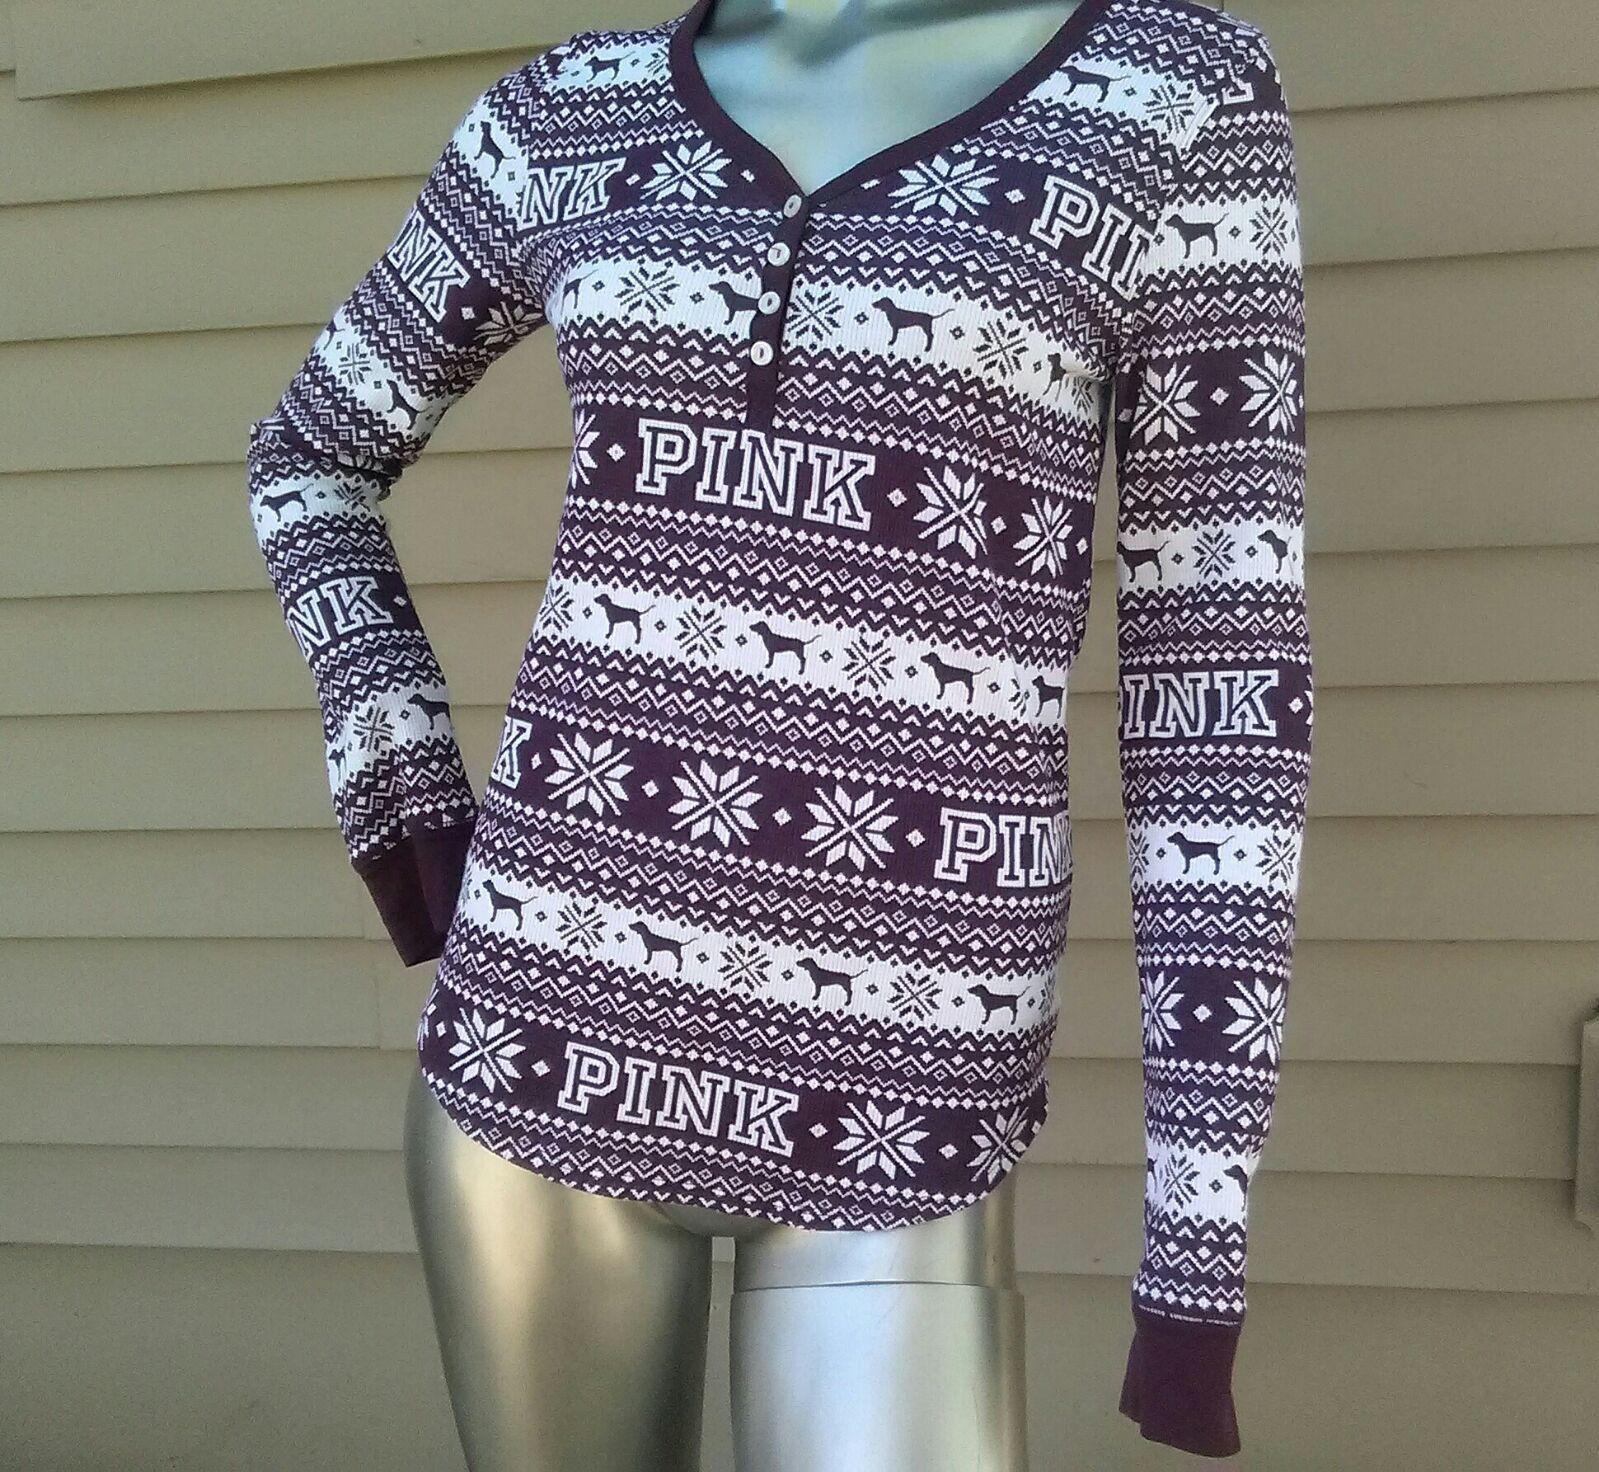 Burgundy VS PINK Christmas L Shirt - Mercari: BUY & SELL THINGS ...